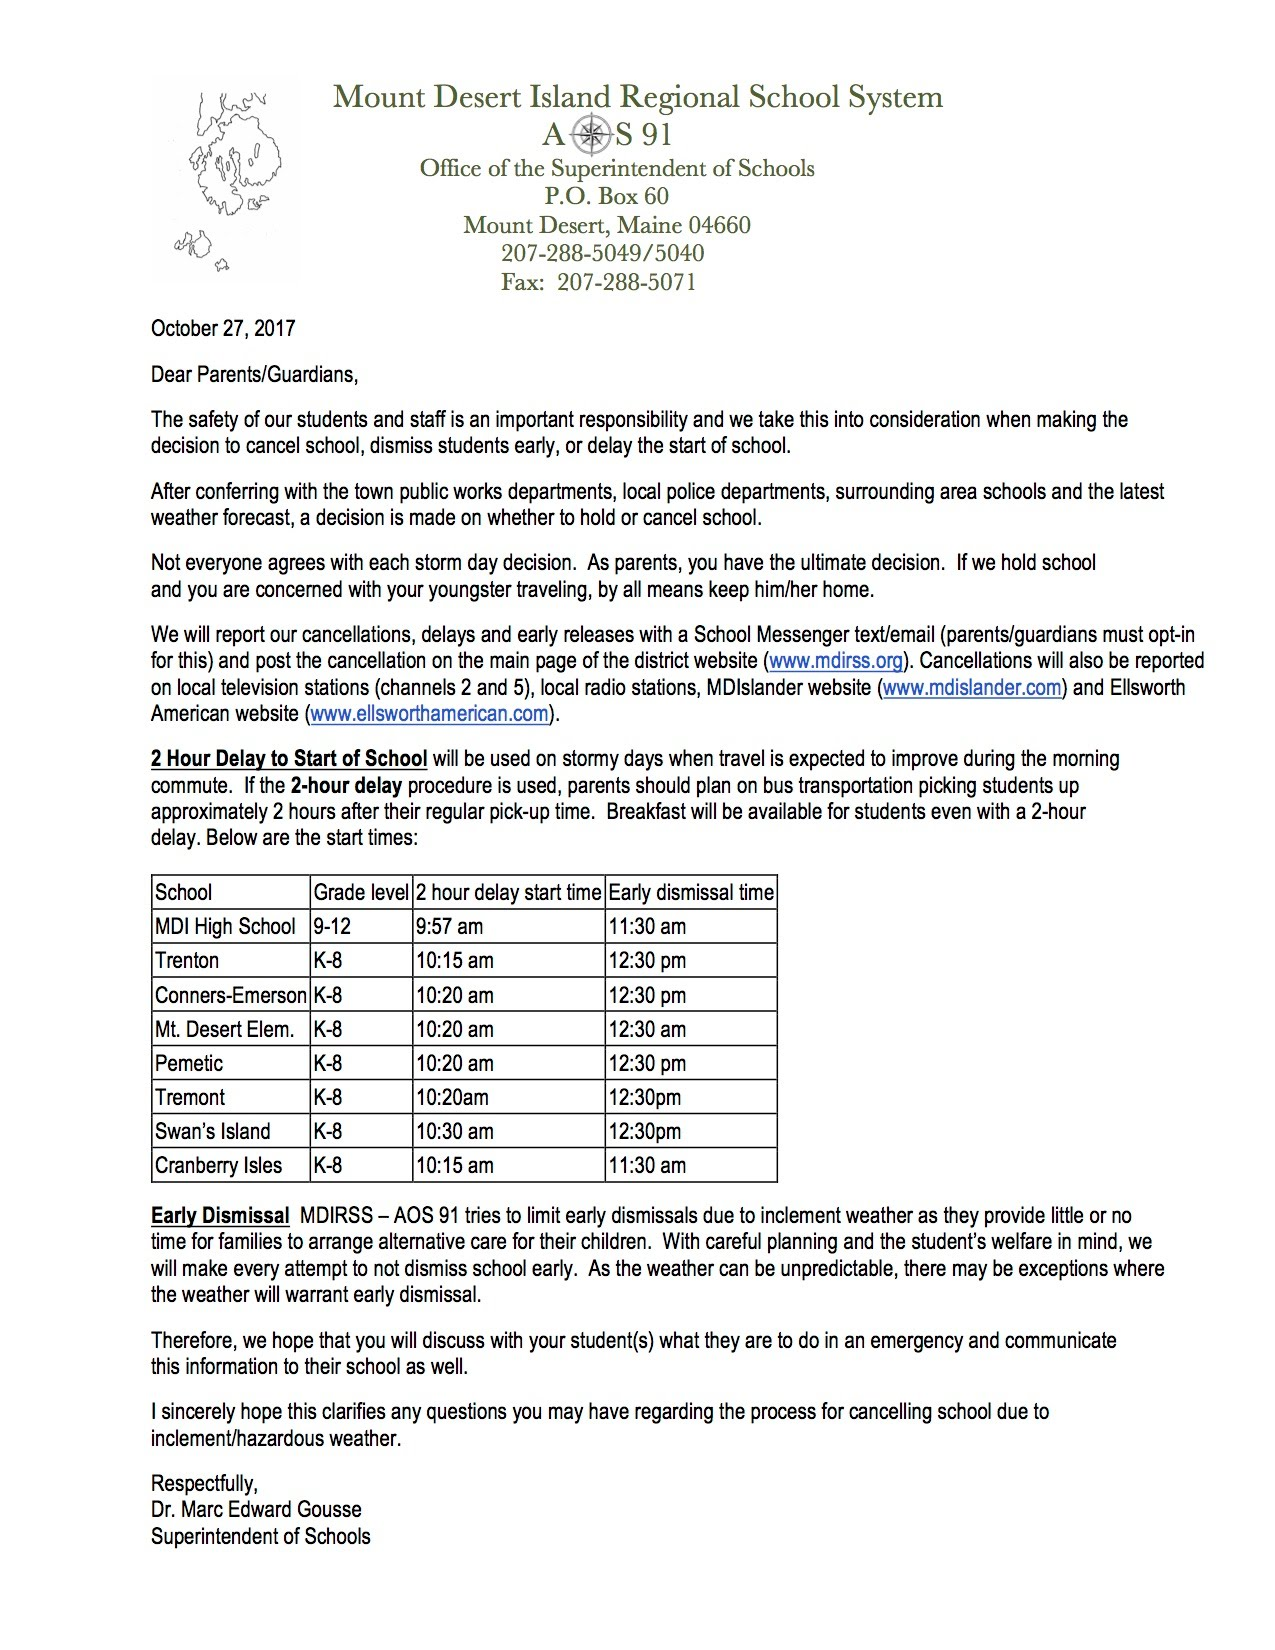 Weather Cancellation Notification - MDIRSS School Cancellations